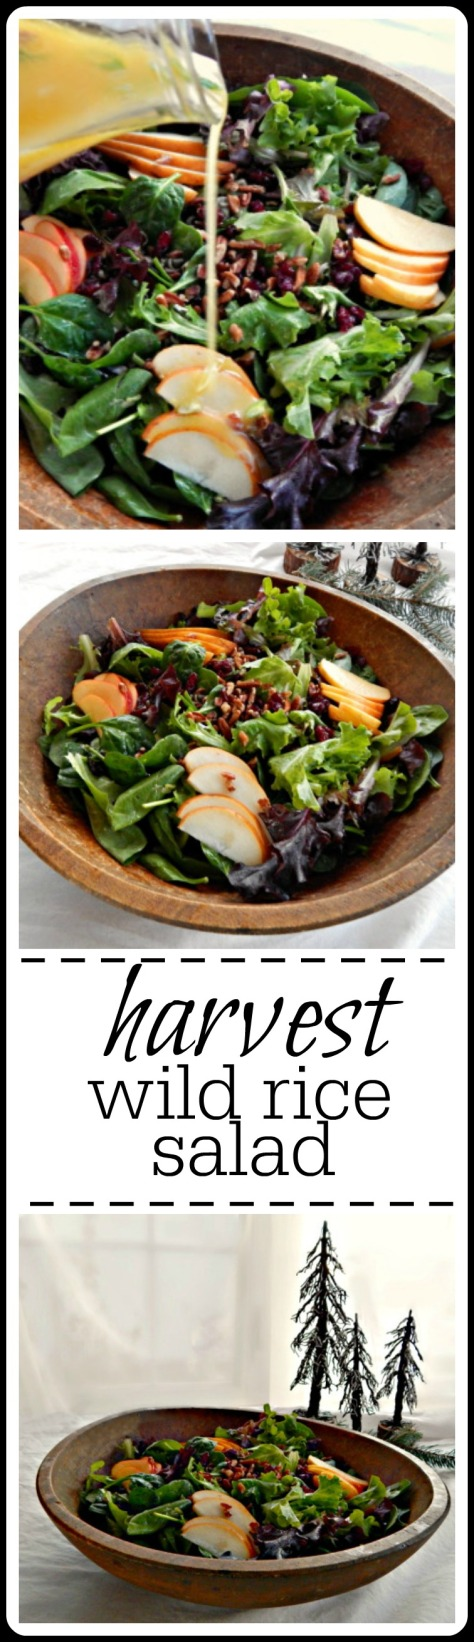 Harvest Wild Rice Salad with Oranges, apples & pears & a citrus vinaigrette